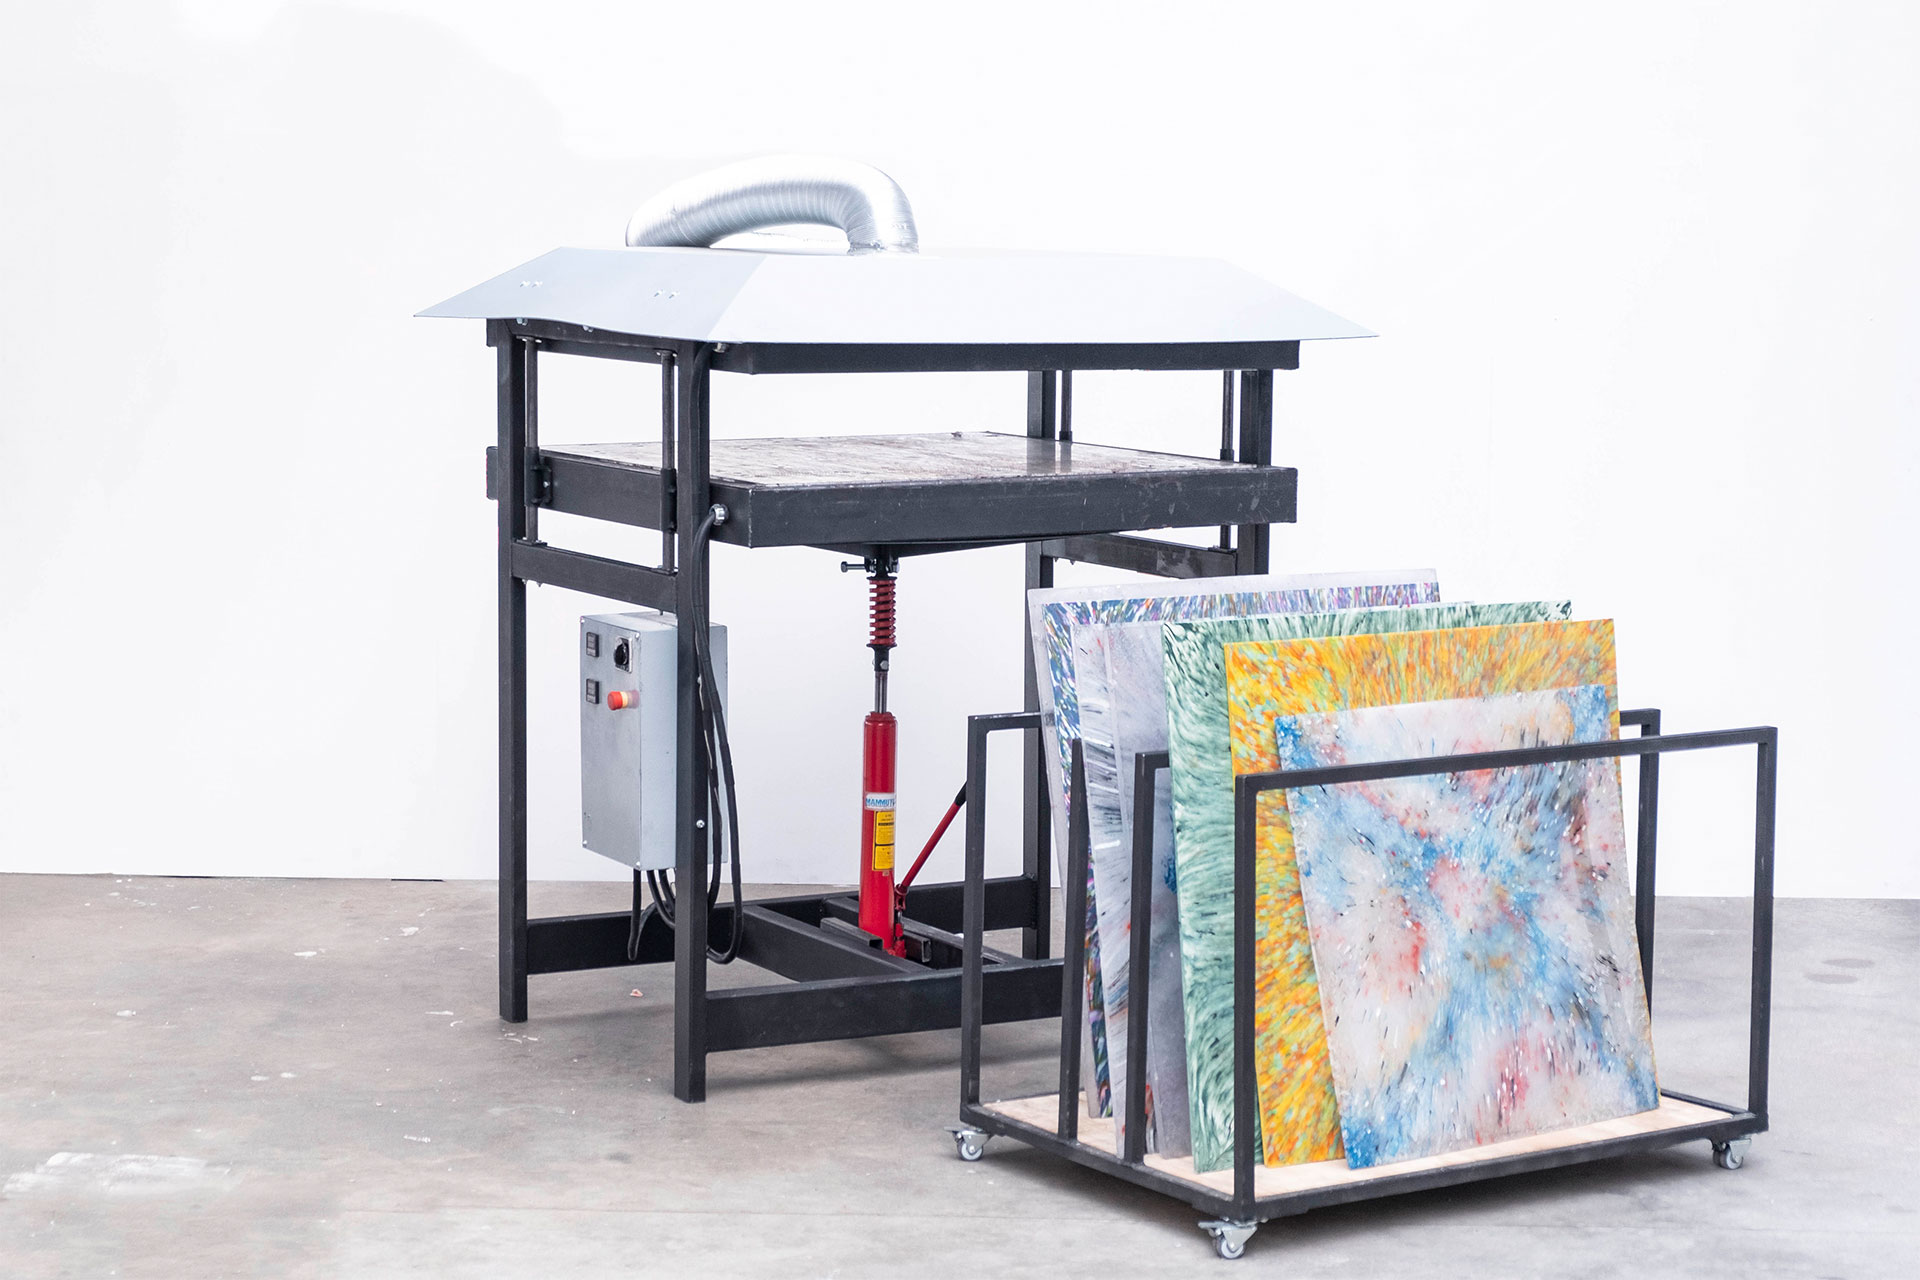 Sheetpress machine and sheets